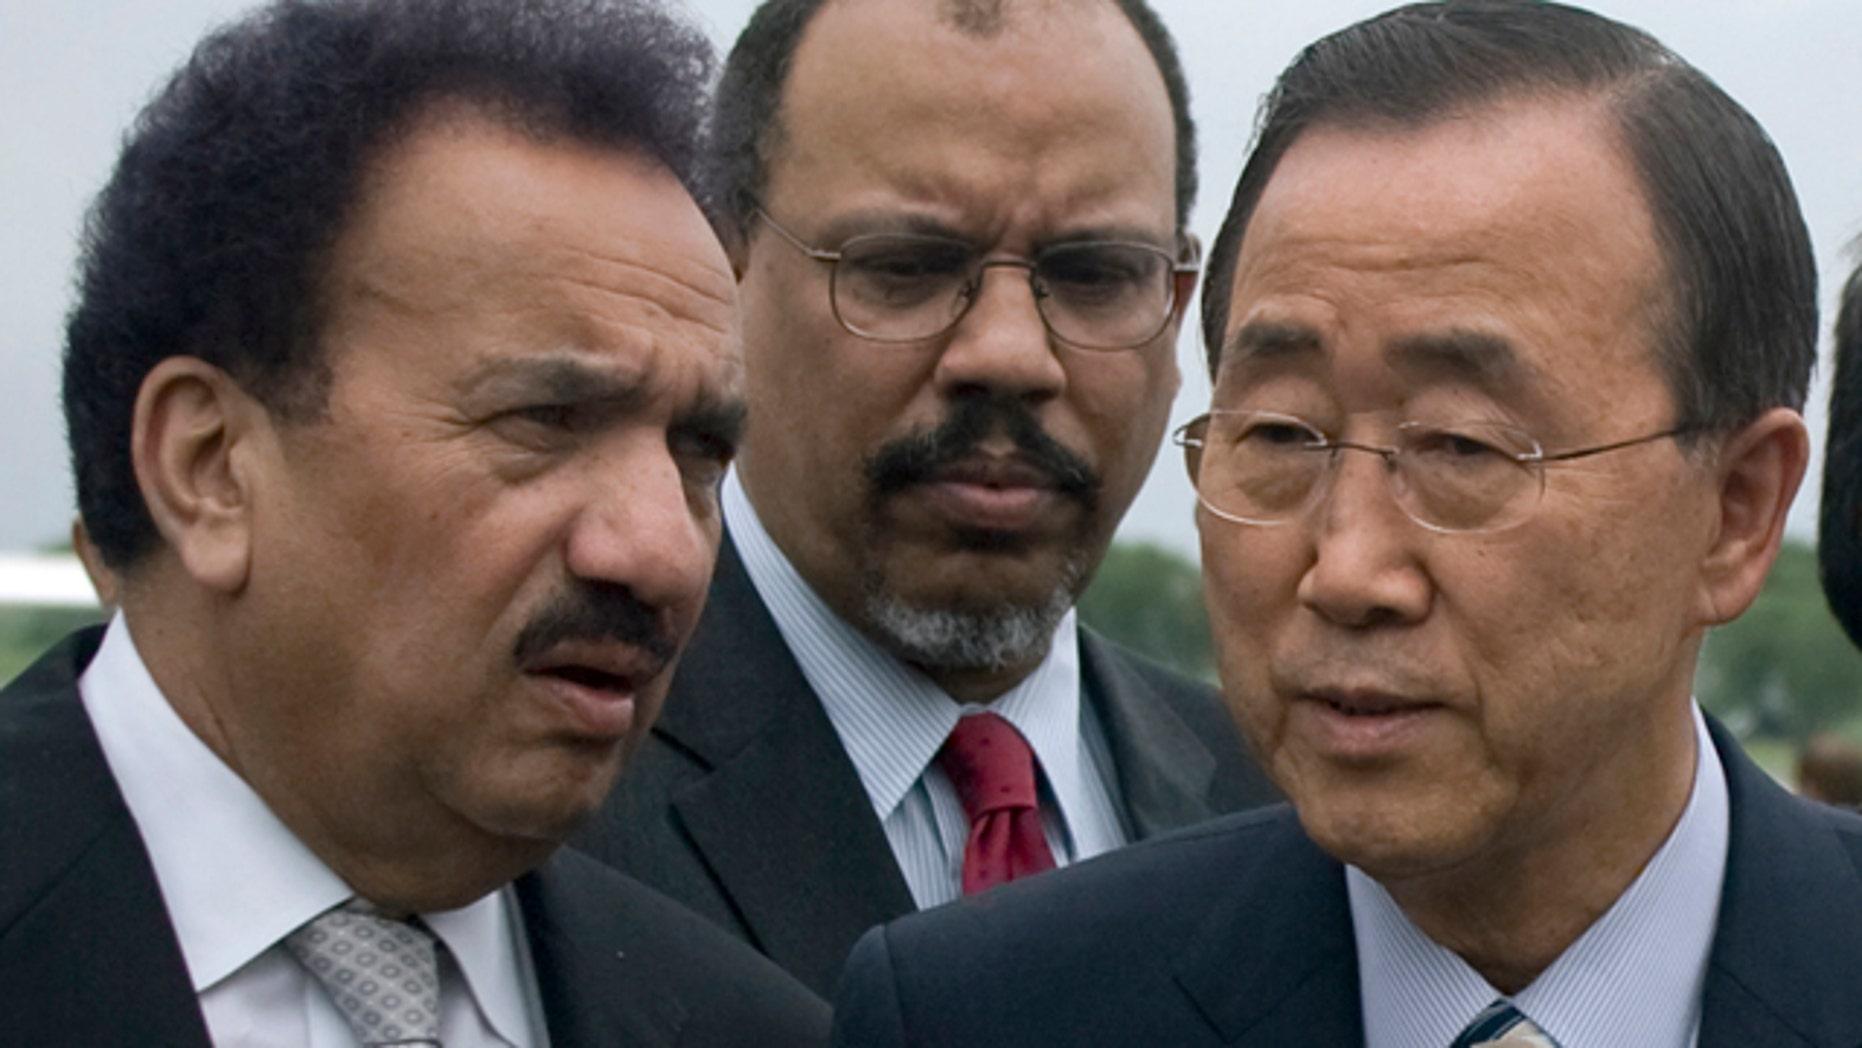 Aug. 15: U.N. Secretary-General Ban Ki-moon, right, talks with Pakistani Interior Minister Rehman Malik, left, upon his arrival at Chaklala airbase in Rawalpindi, Pakistan, to survey flood-ravaged Pakistan. (AP photo)